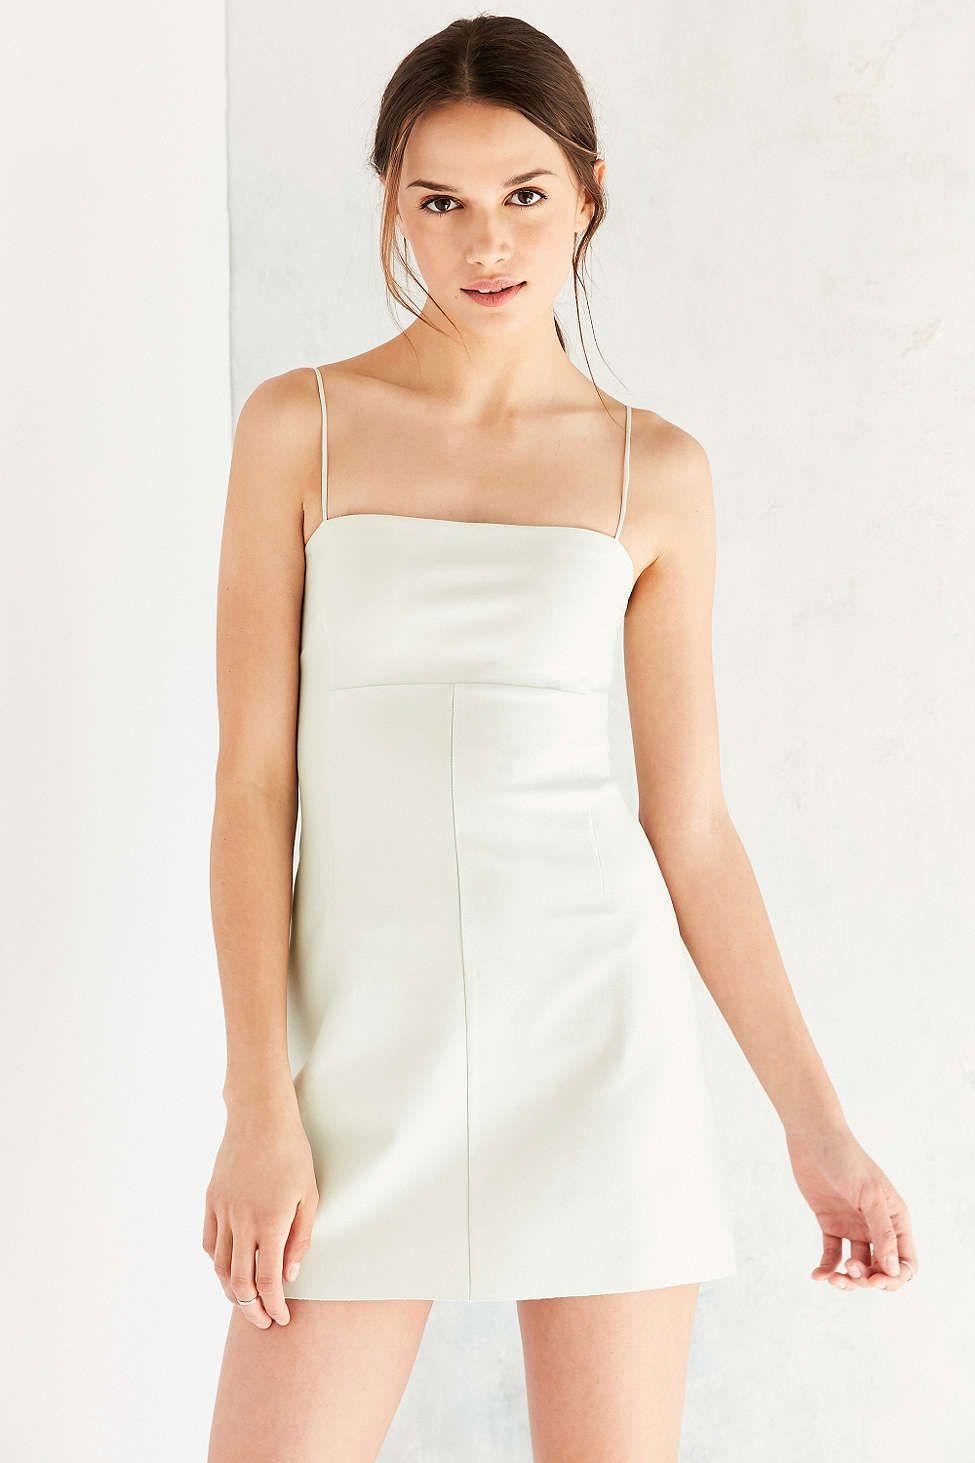 fa33c5c6076 Silence + Noise Audrey Ponte A-Line Mini Dress - Urban Outfitters ...